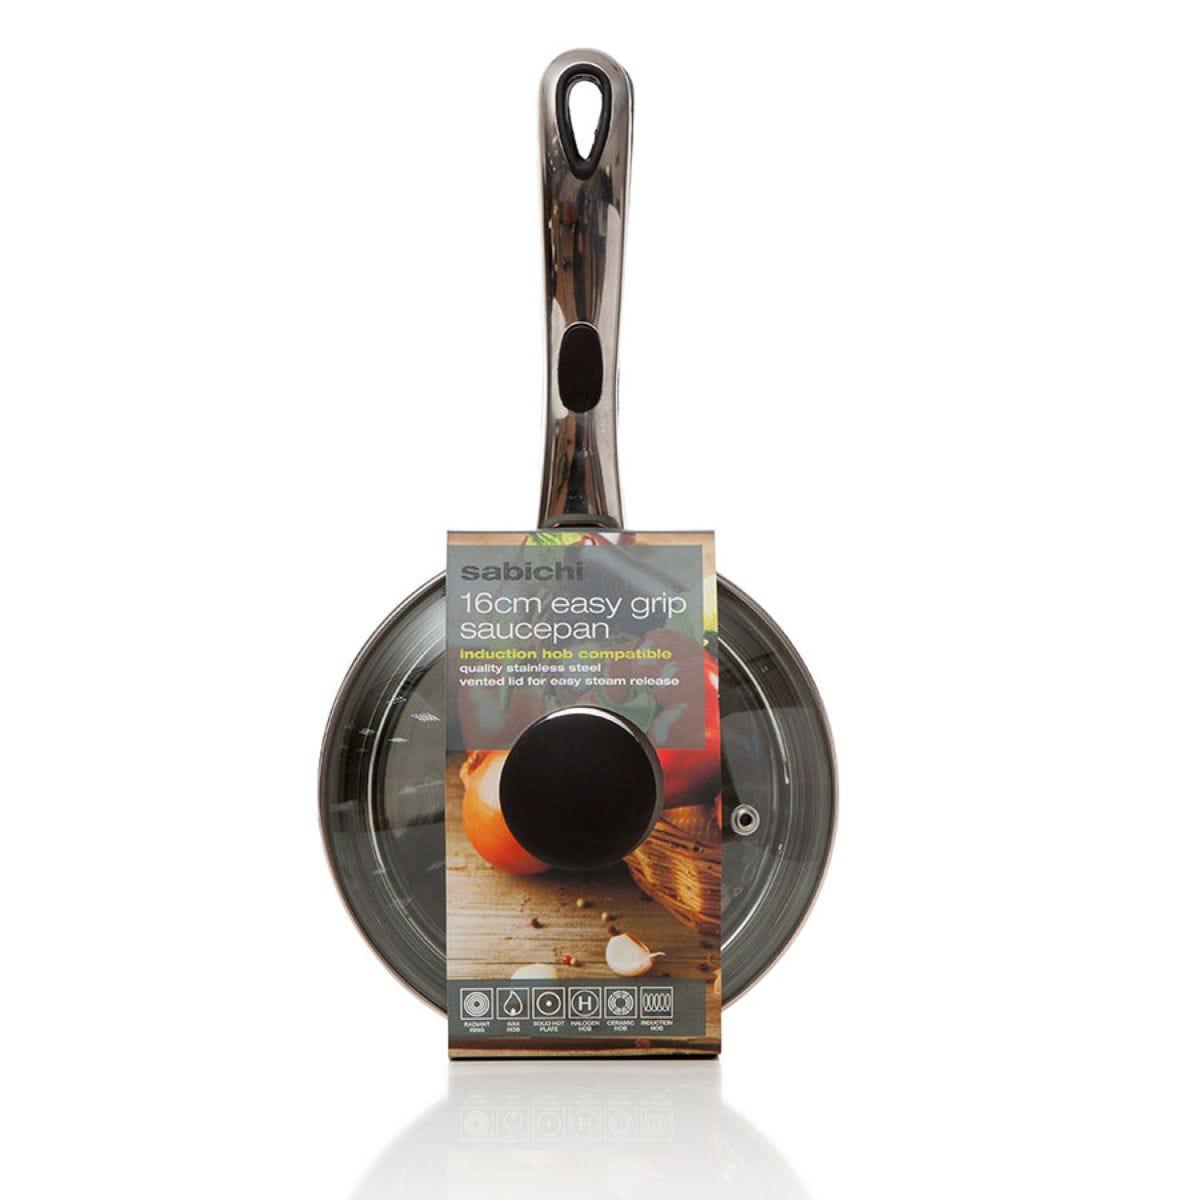 Sabichi Easy Grip Stainless Steel Saucepan - 16cm